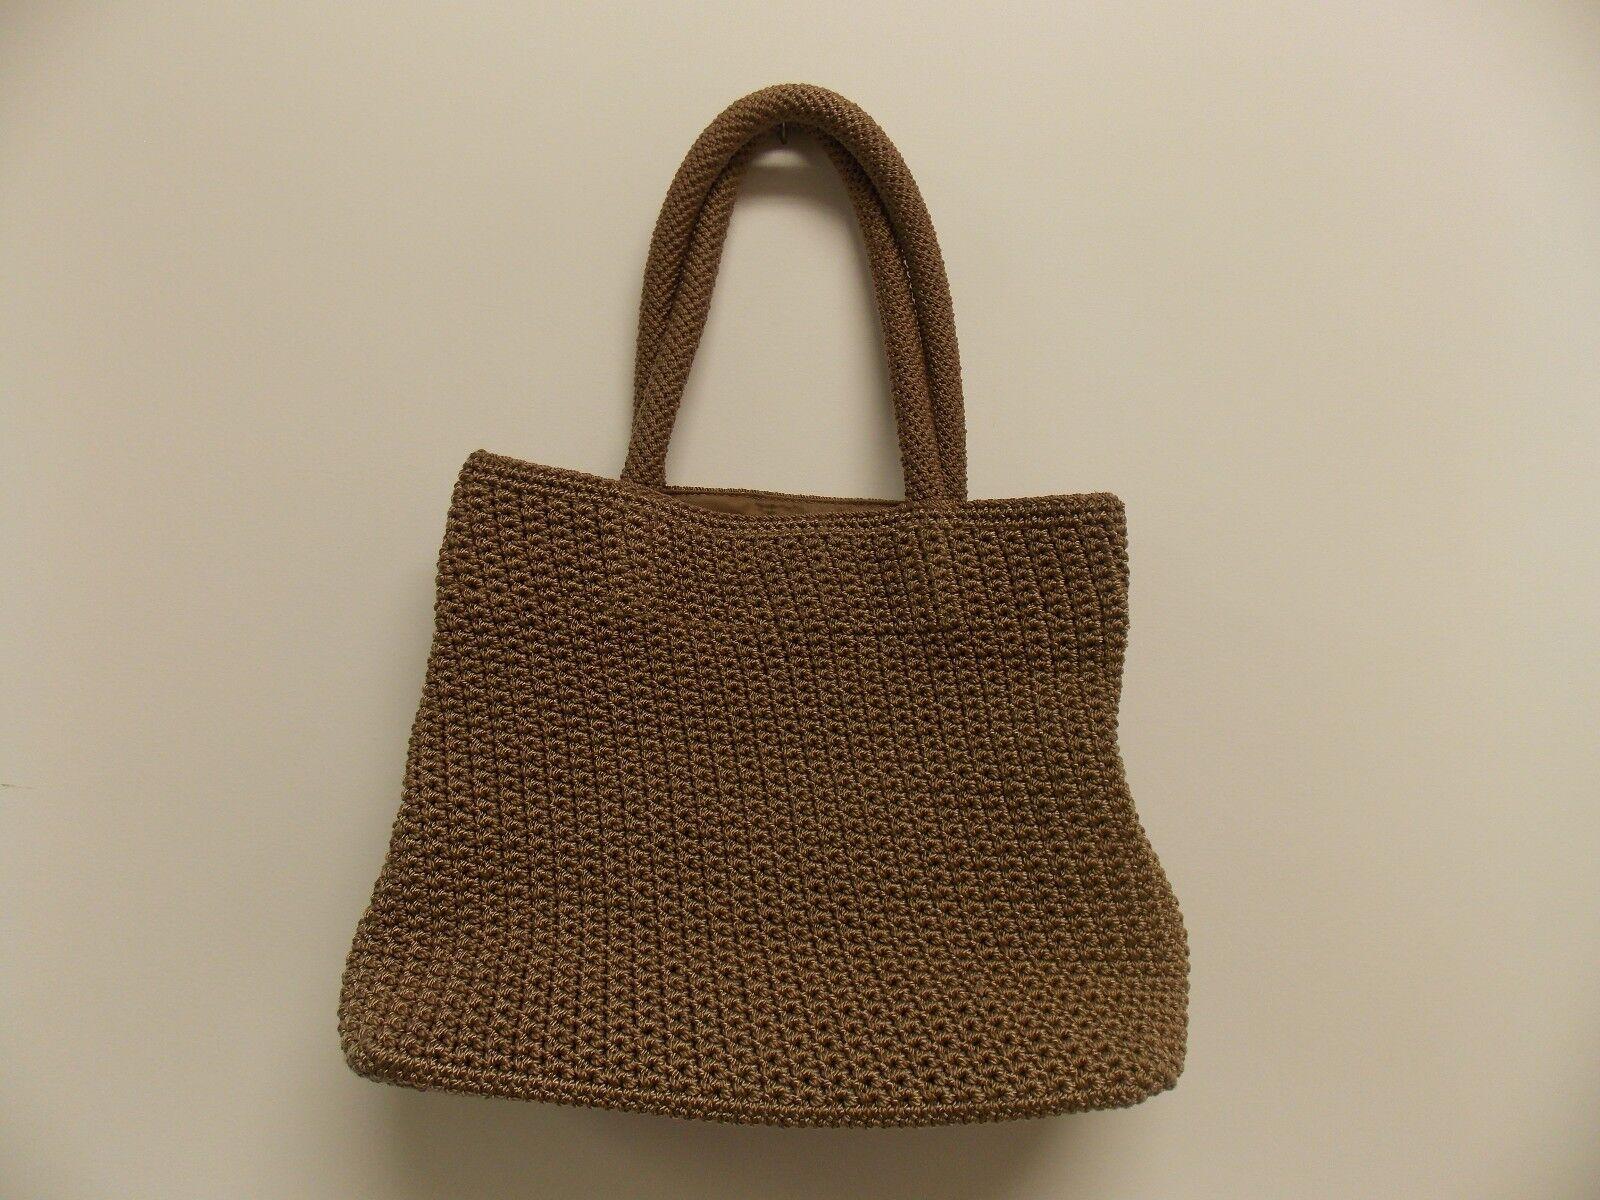 TALBOTS Handbag Purse Tote Beige Knitted Nylon Lined